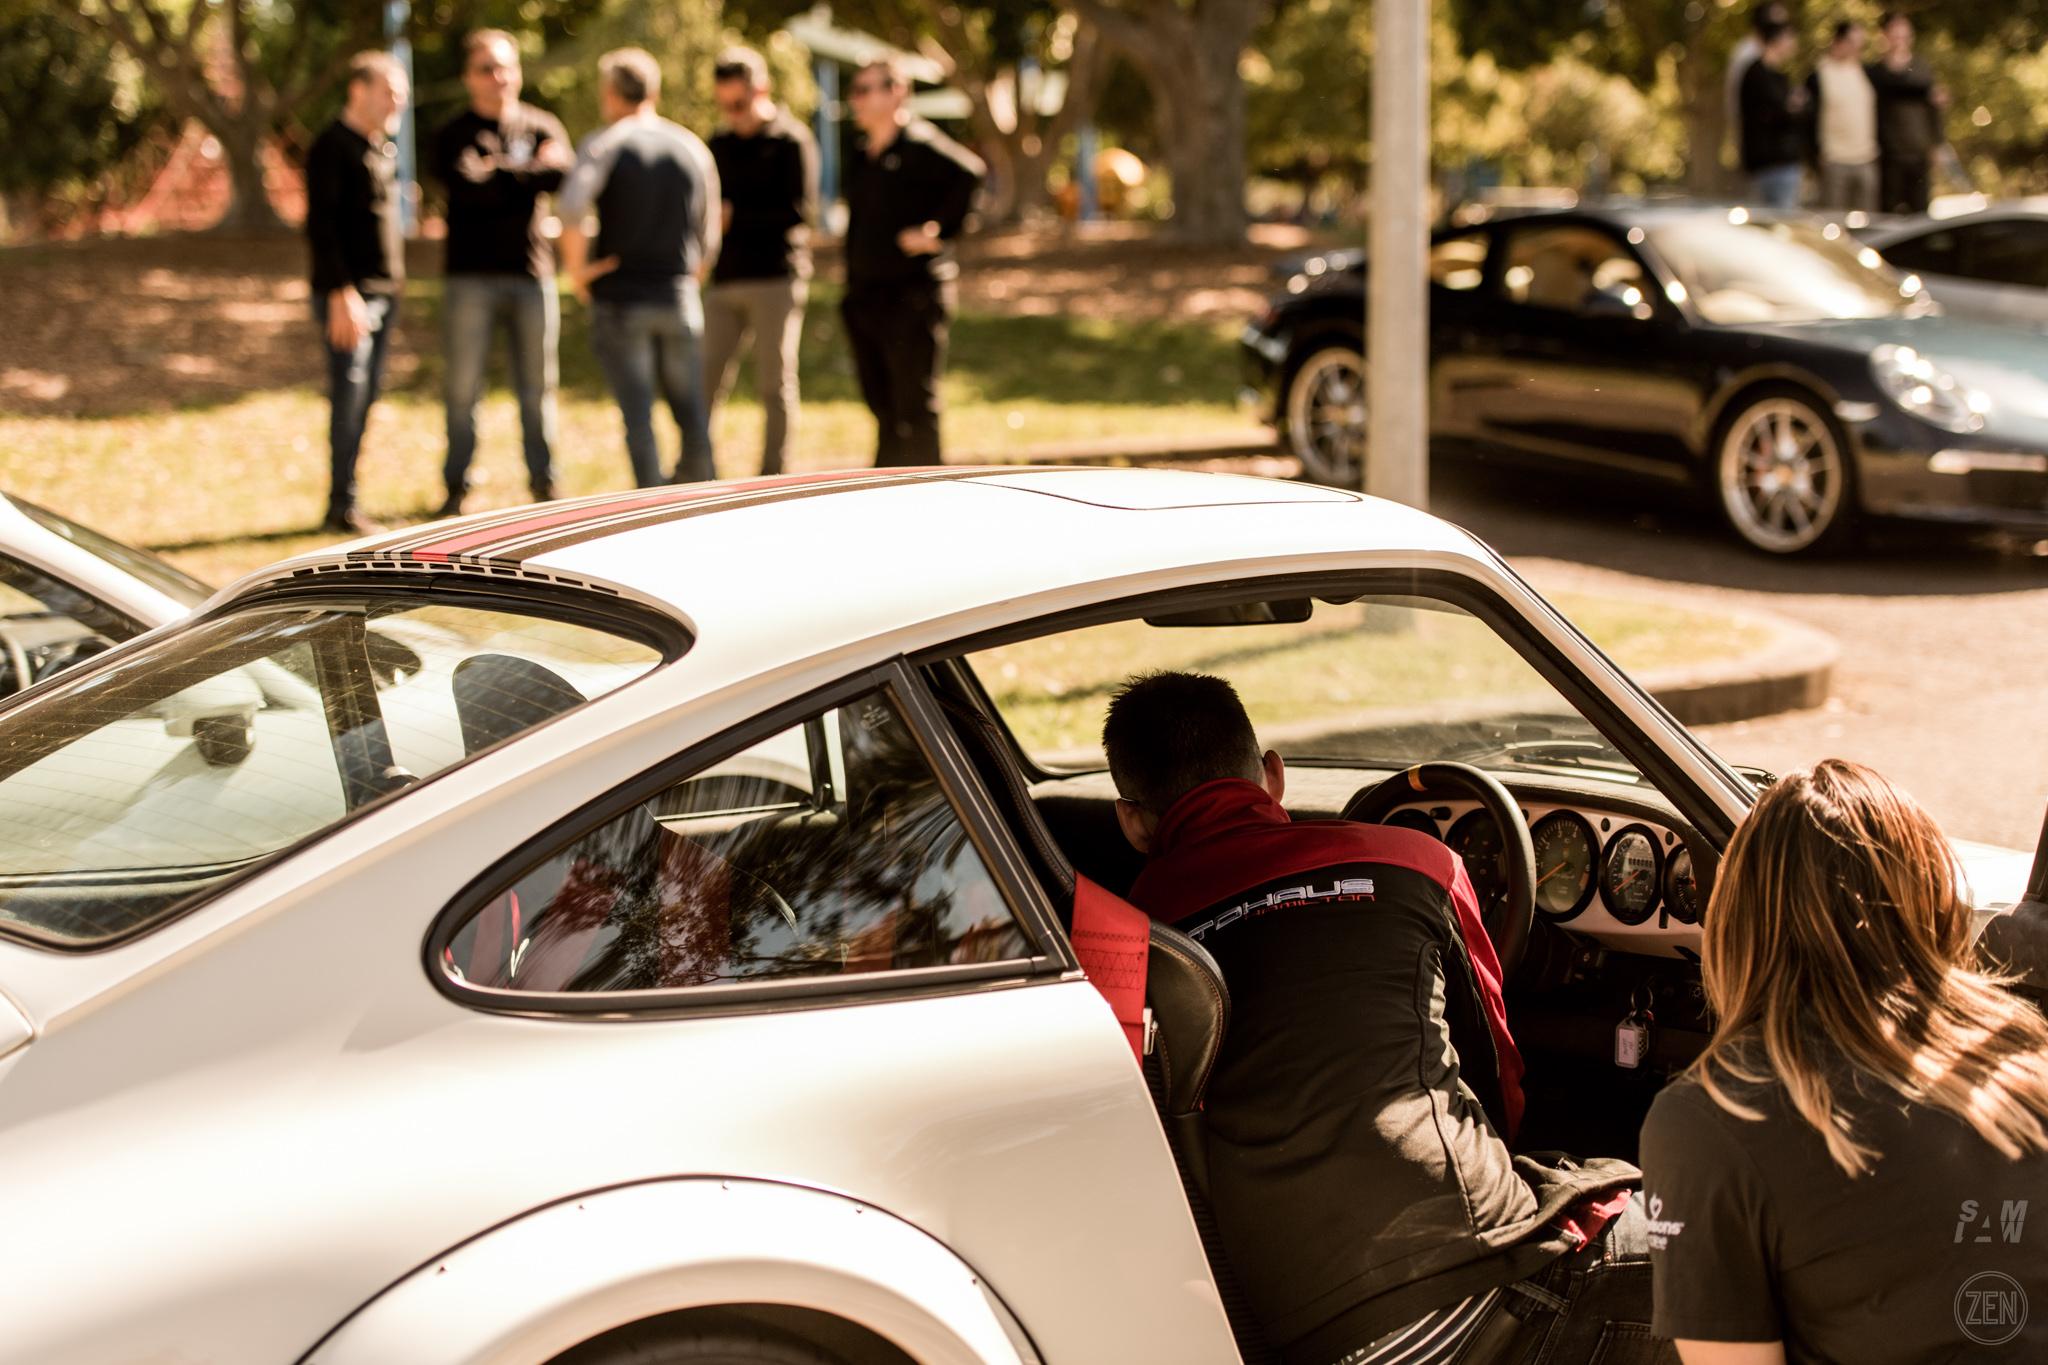 2019-10-27 - Autohaus Porsches & Coffee 169